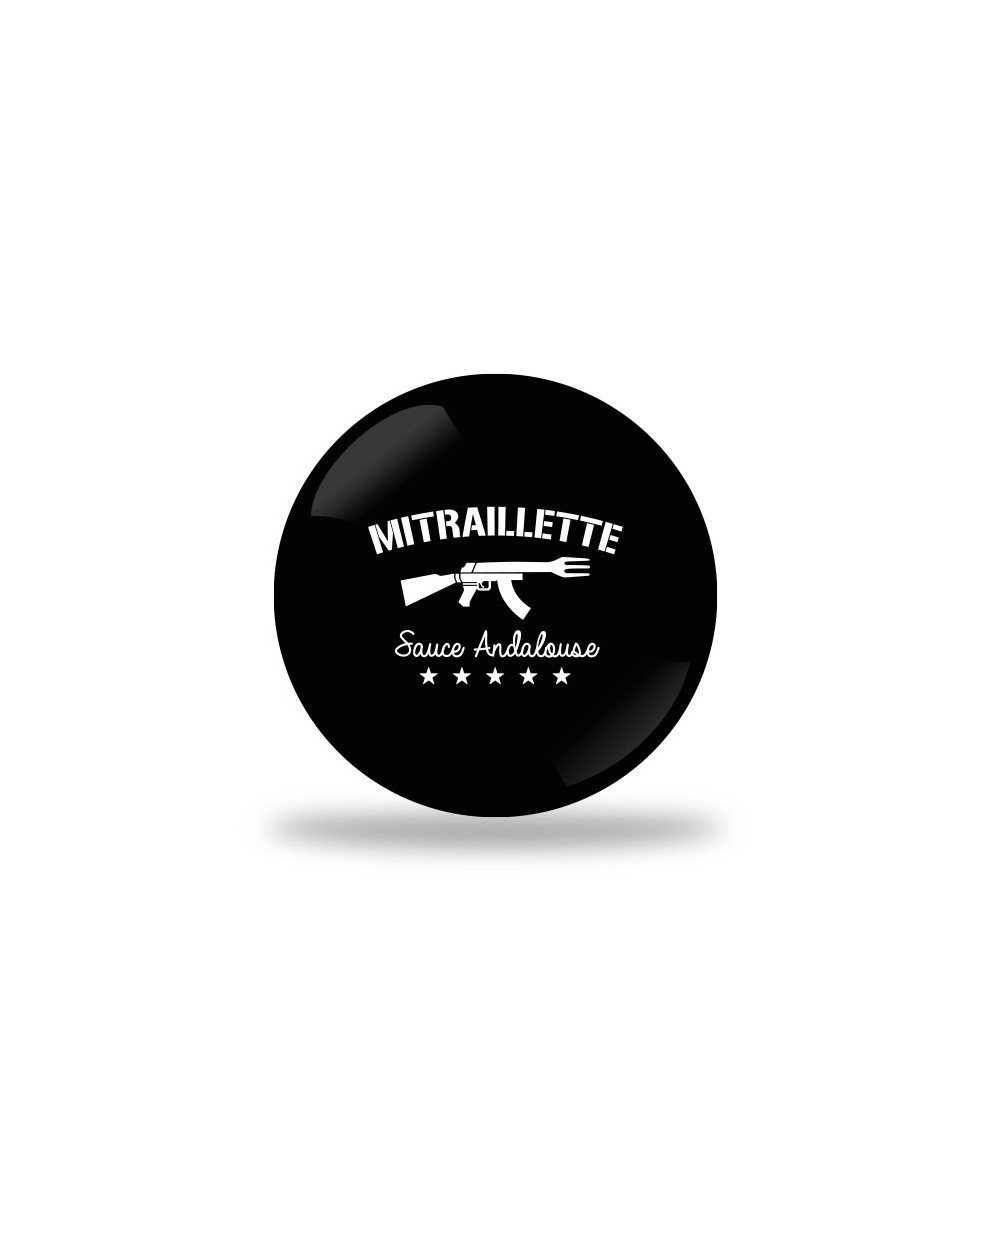 Mitraillette Badge